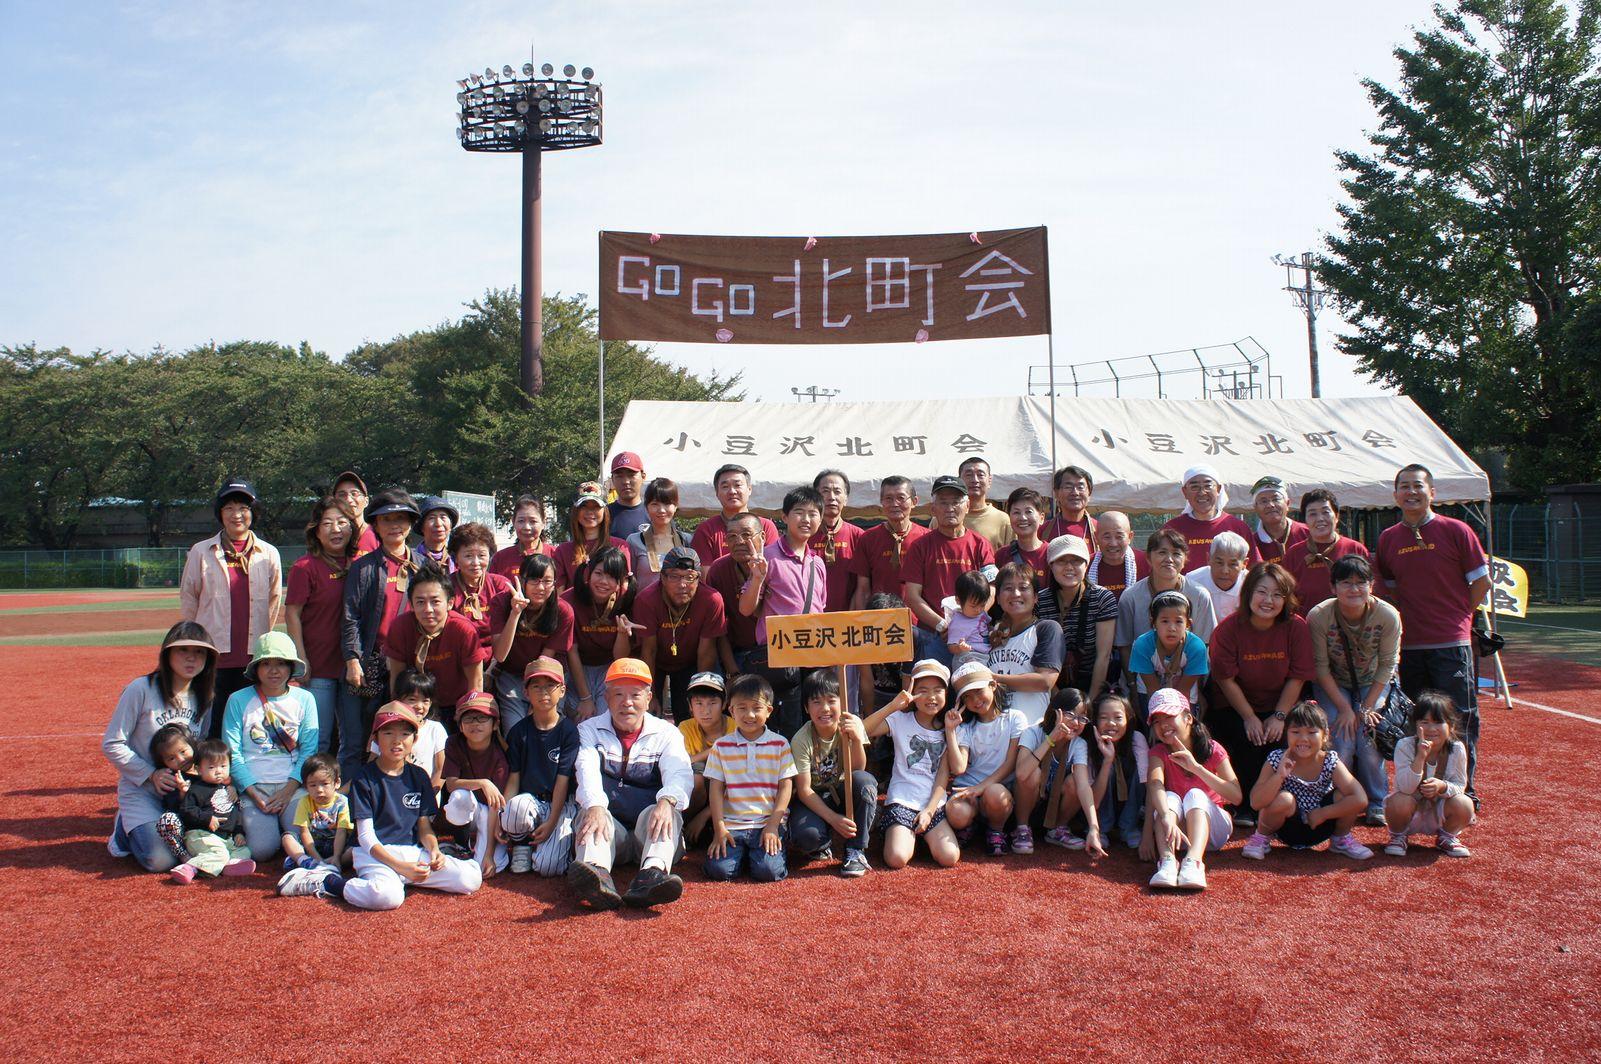 志村坂上地区スポーツ大会